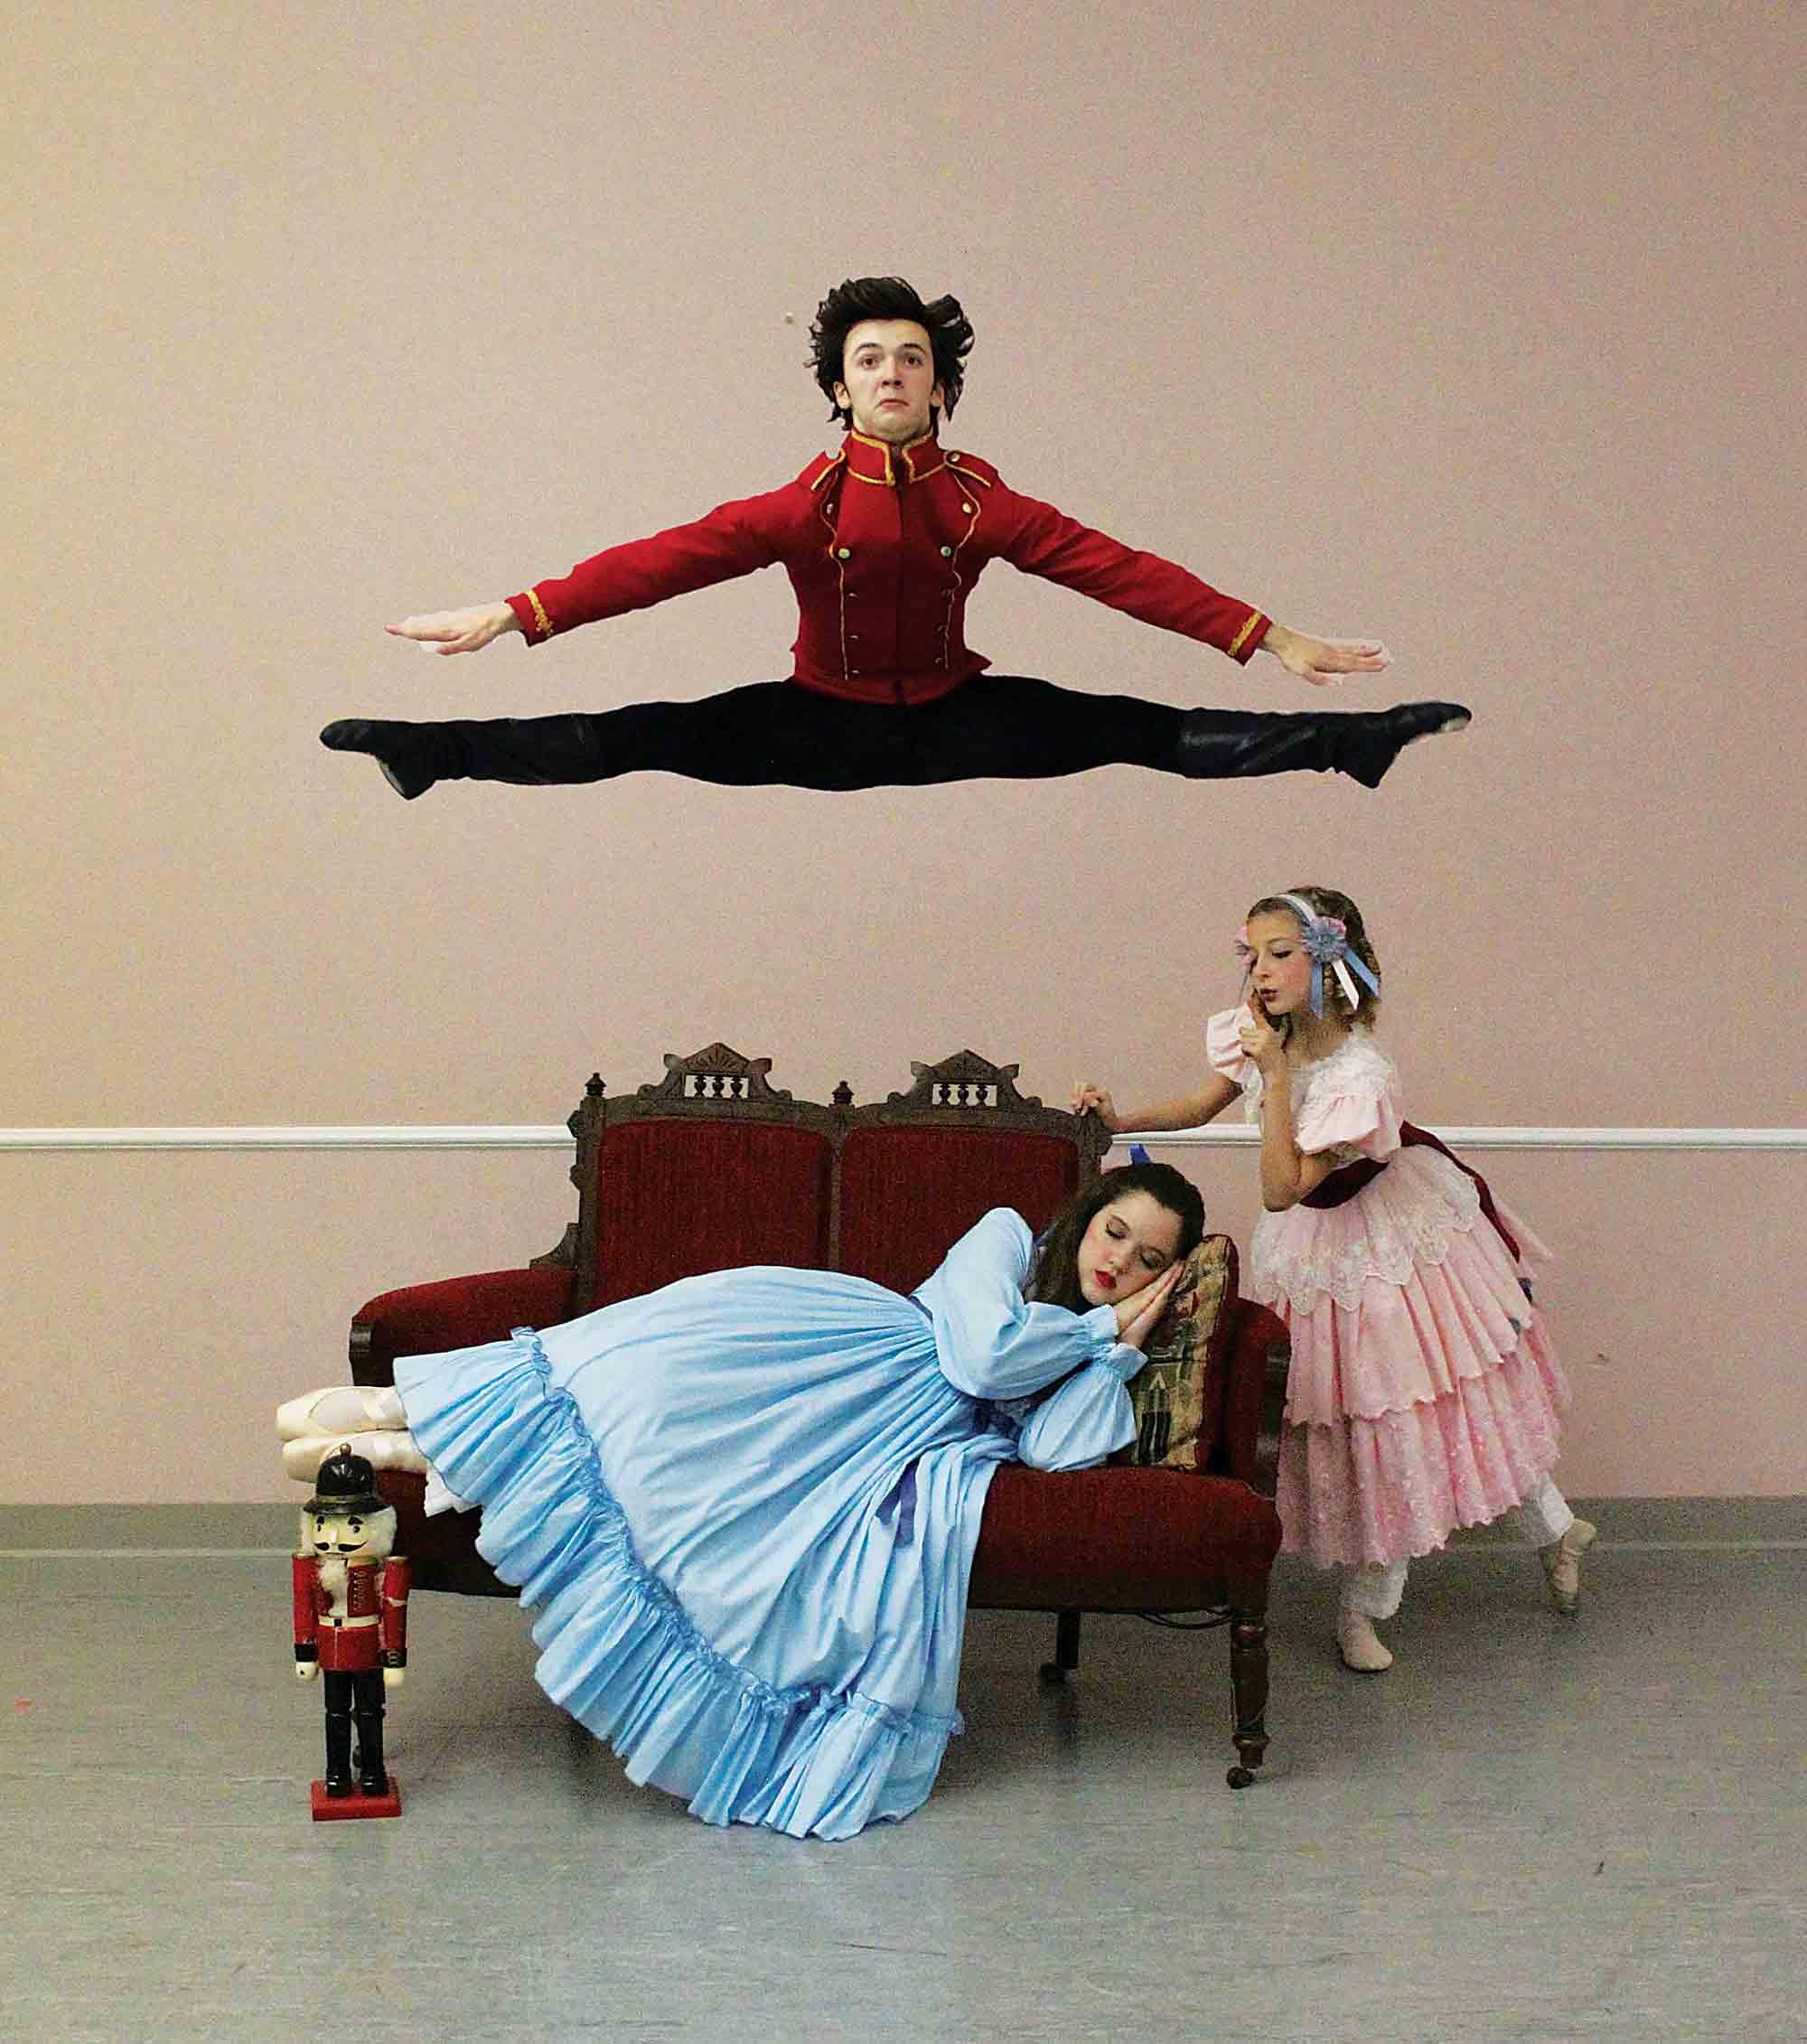 Schrader ballet to perform 'The Nutcracker (Clara's Dream)' | News, Sports, Jobs